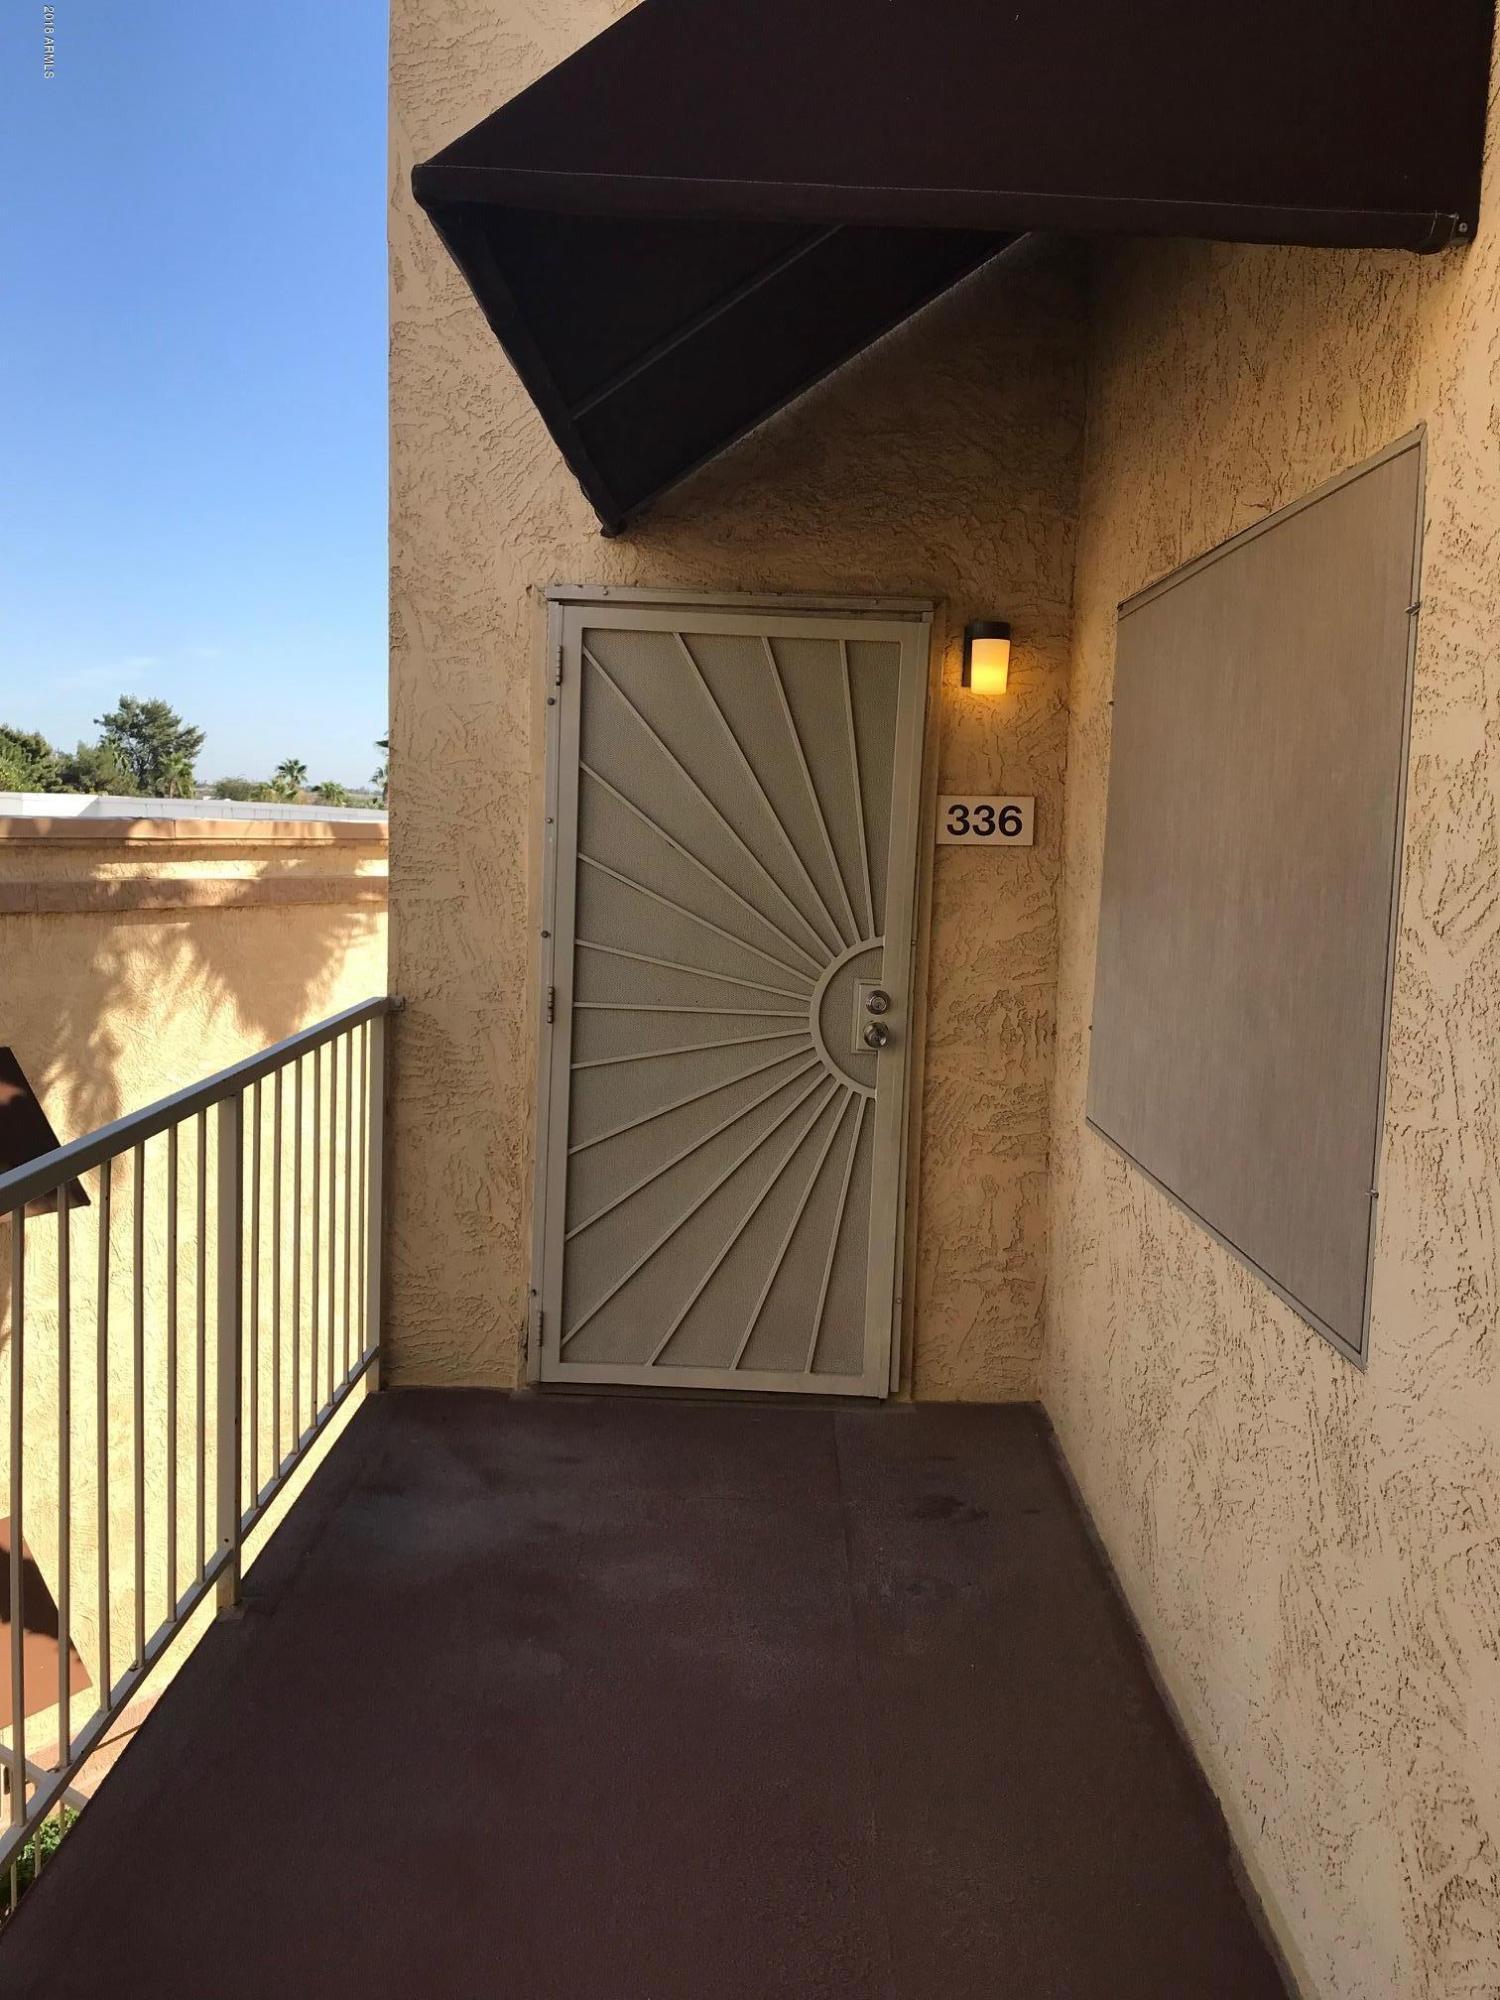 Photo of 12221 W BELL Road #336, Surprise, AZ 85378